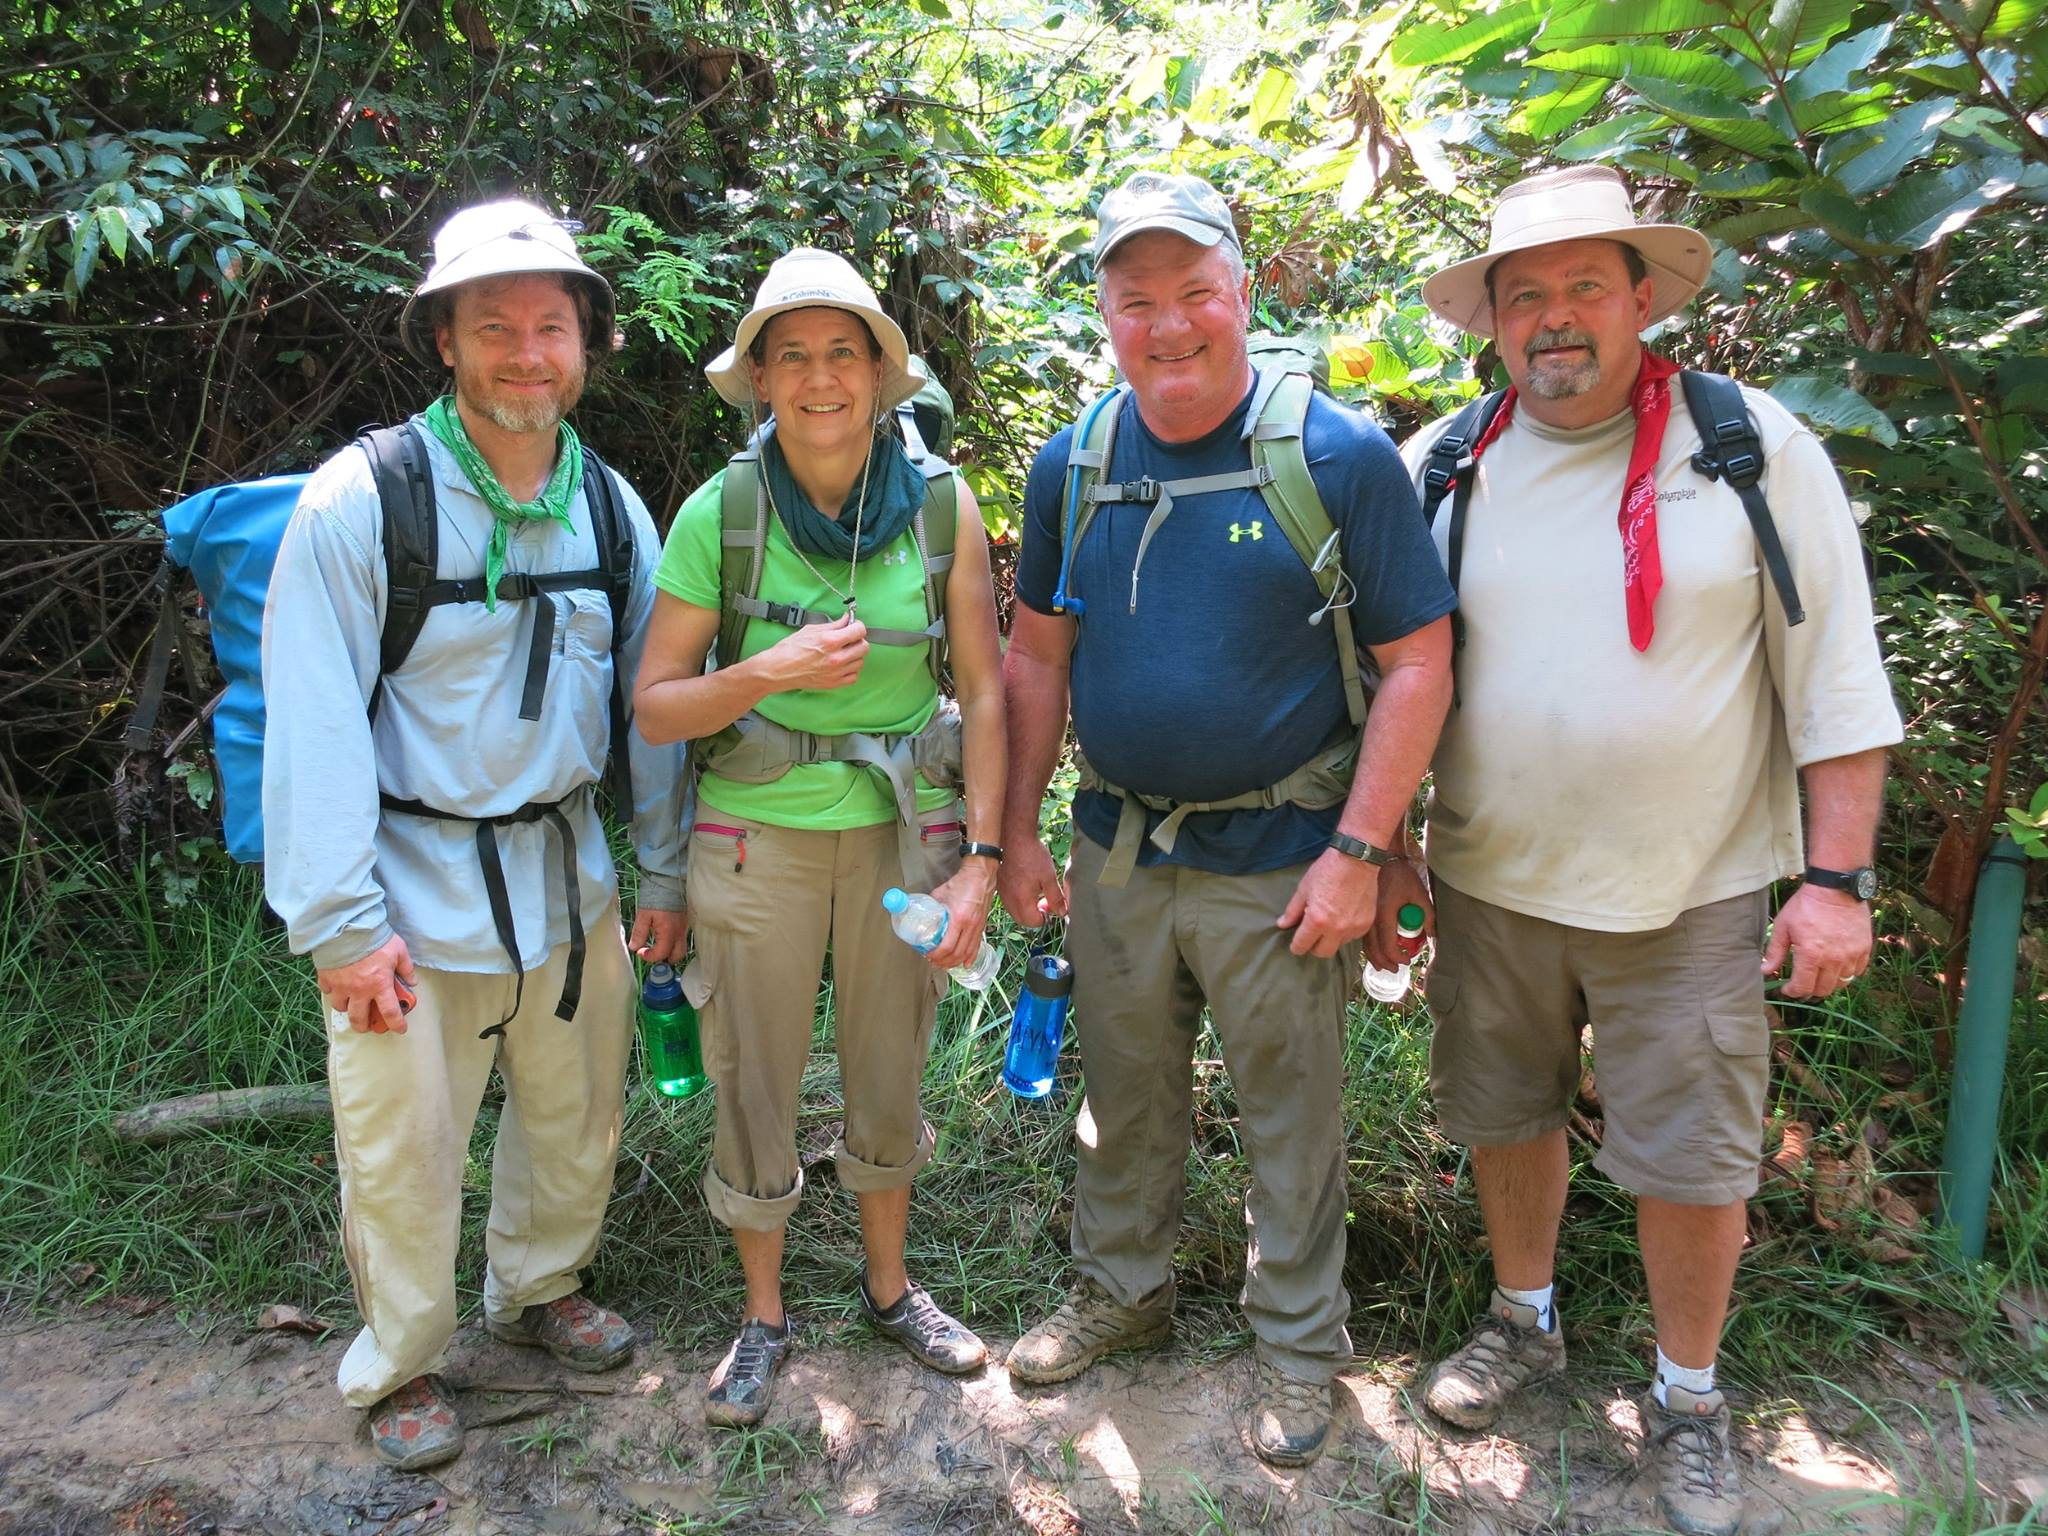 Trek through the jungle